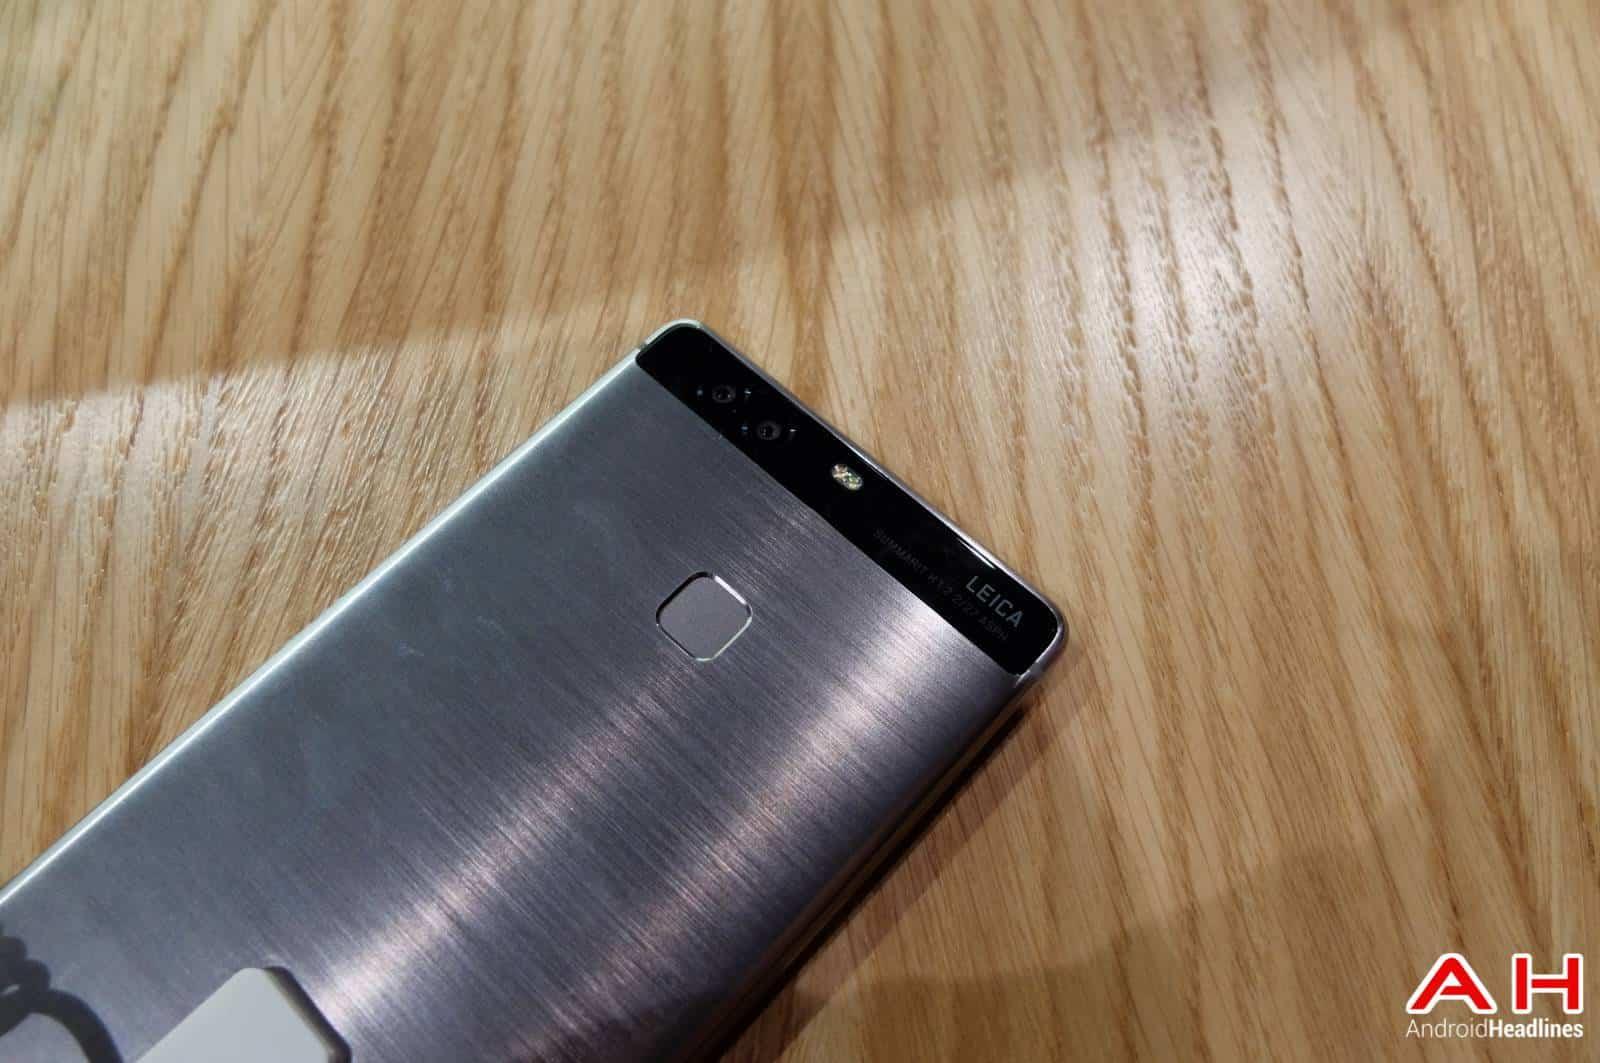 Huawei P9 Plus AH 0496